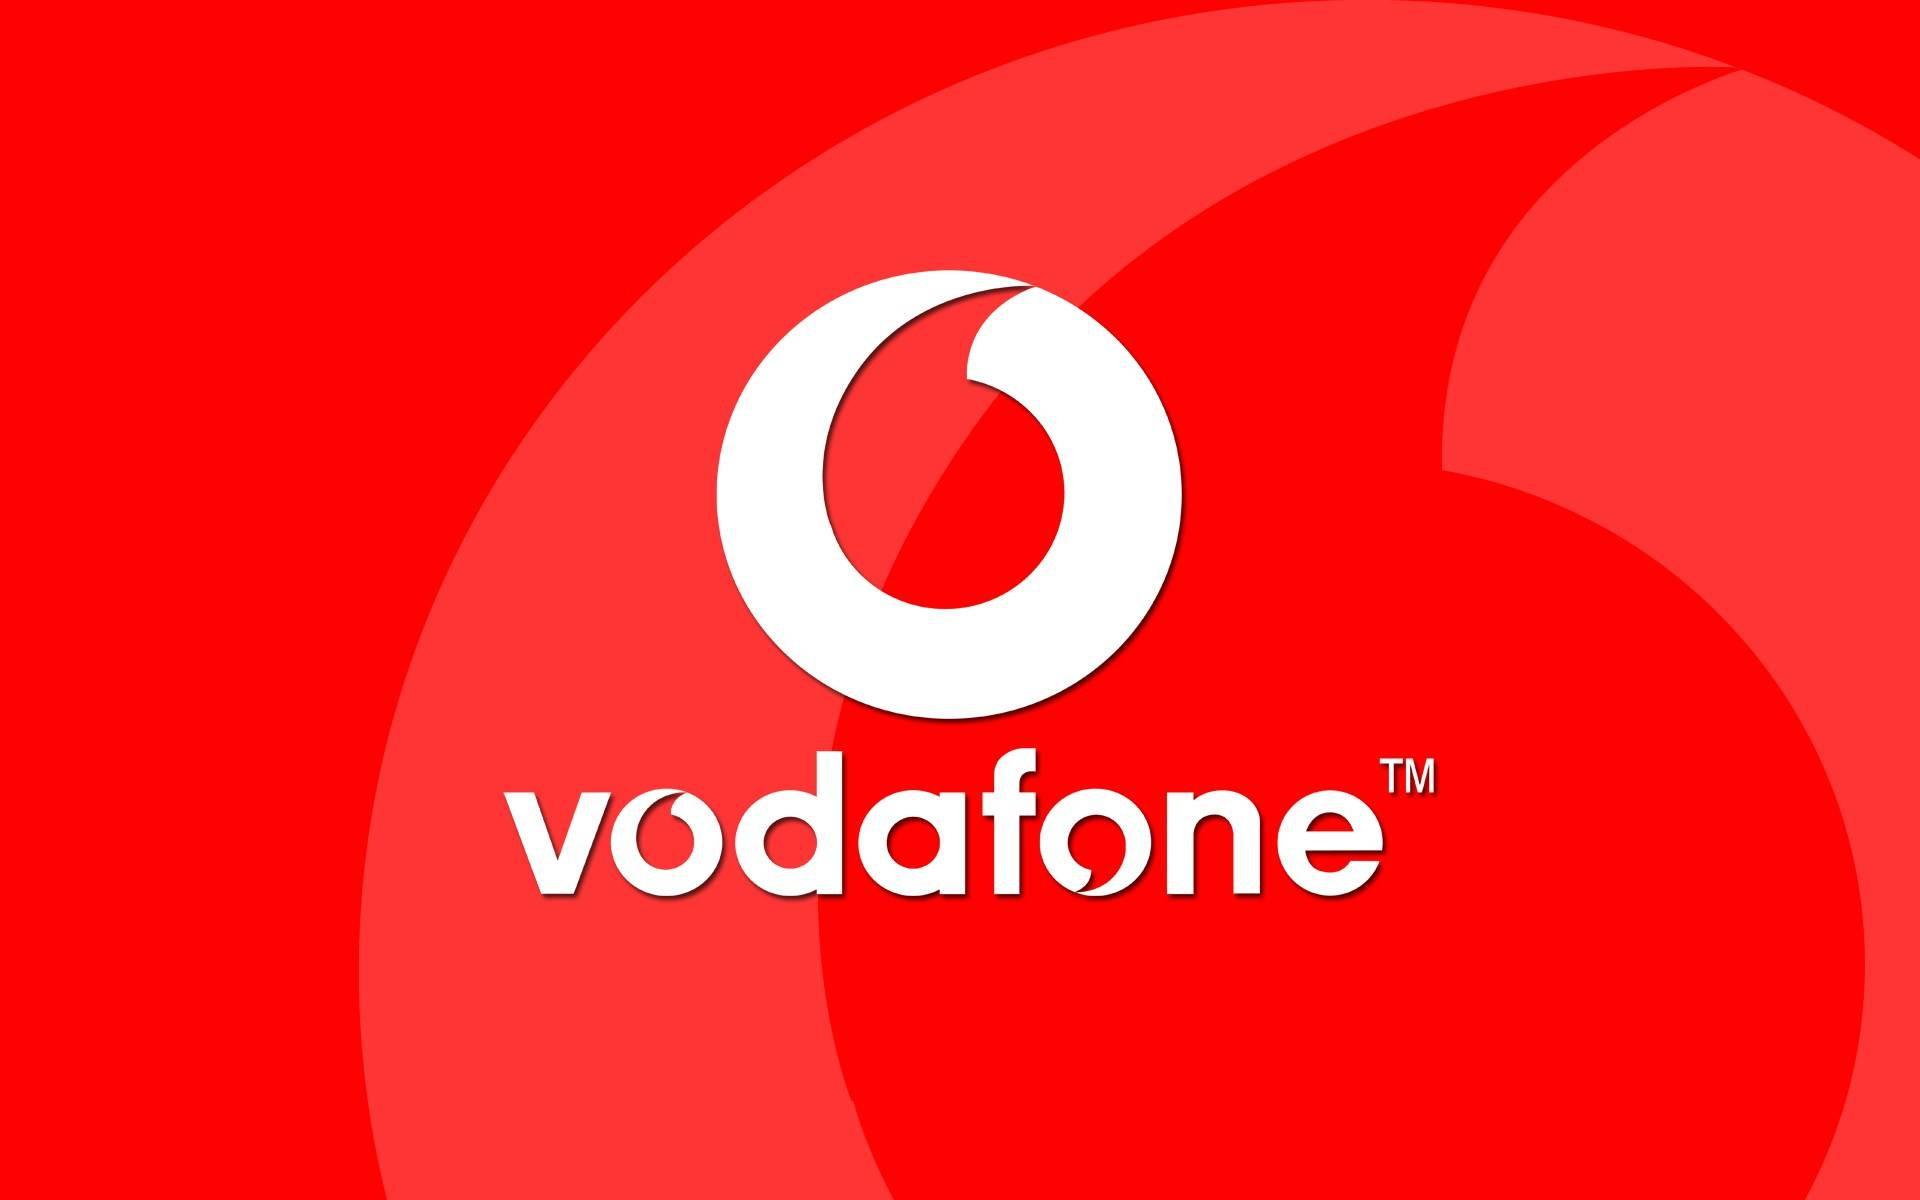 Vodafone serial